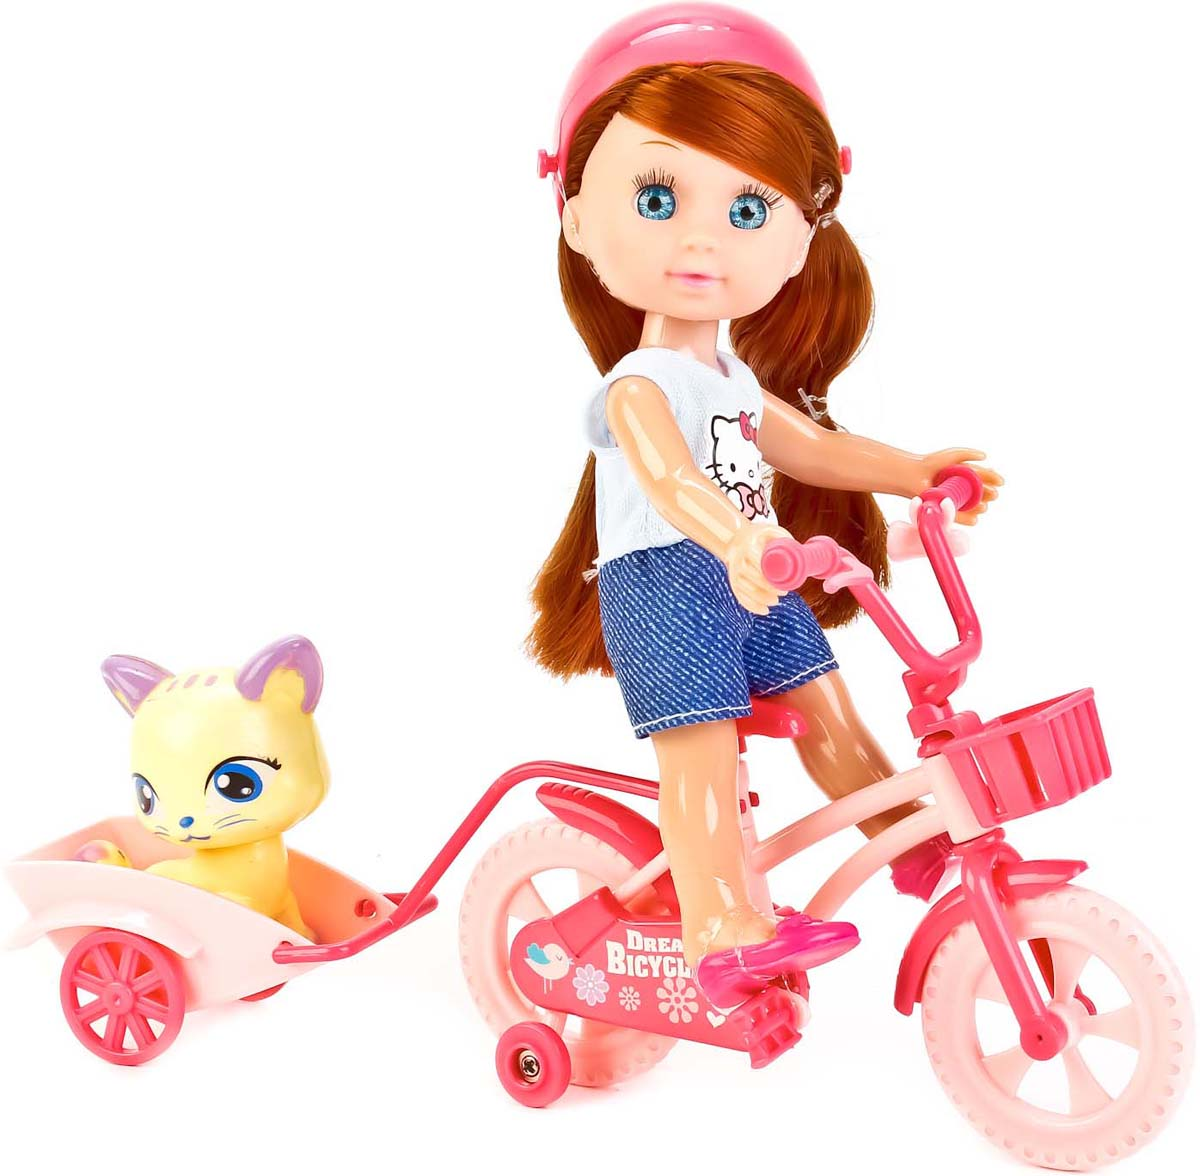 Карапуз Кукла Hello Kitty Машенька на велосипеде кукла кана из серии джуку